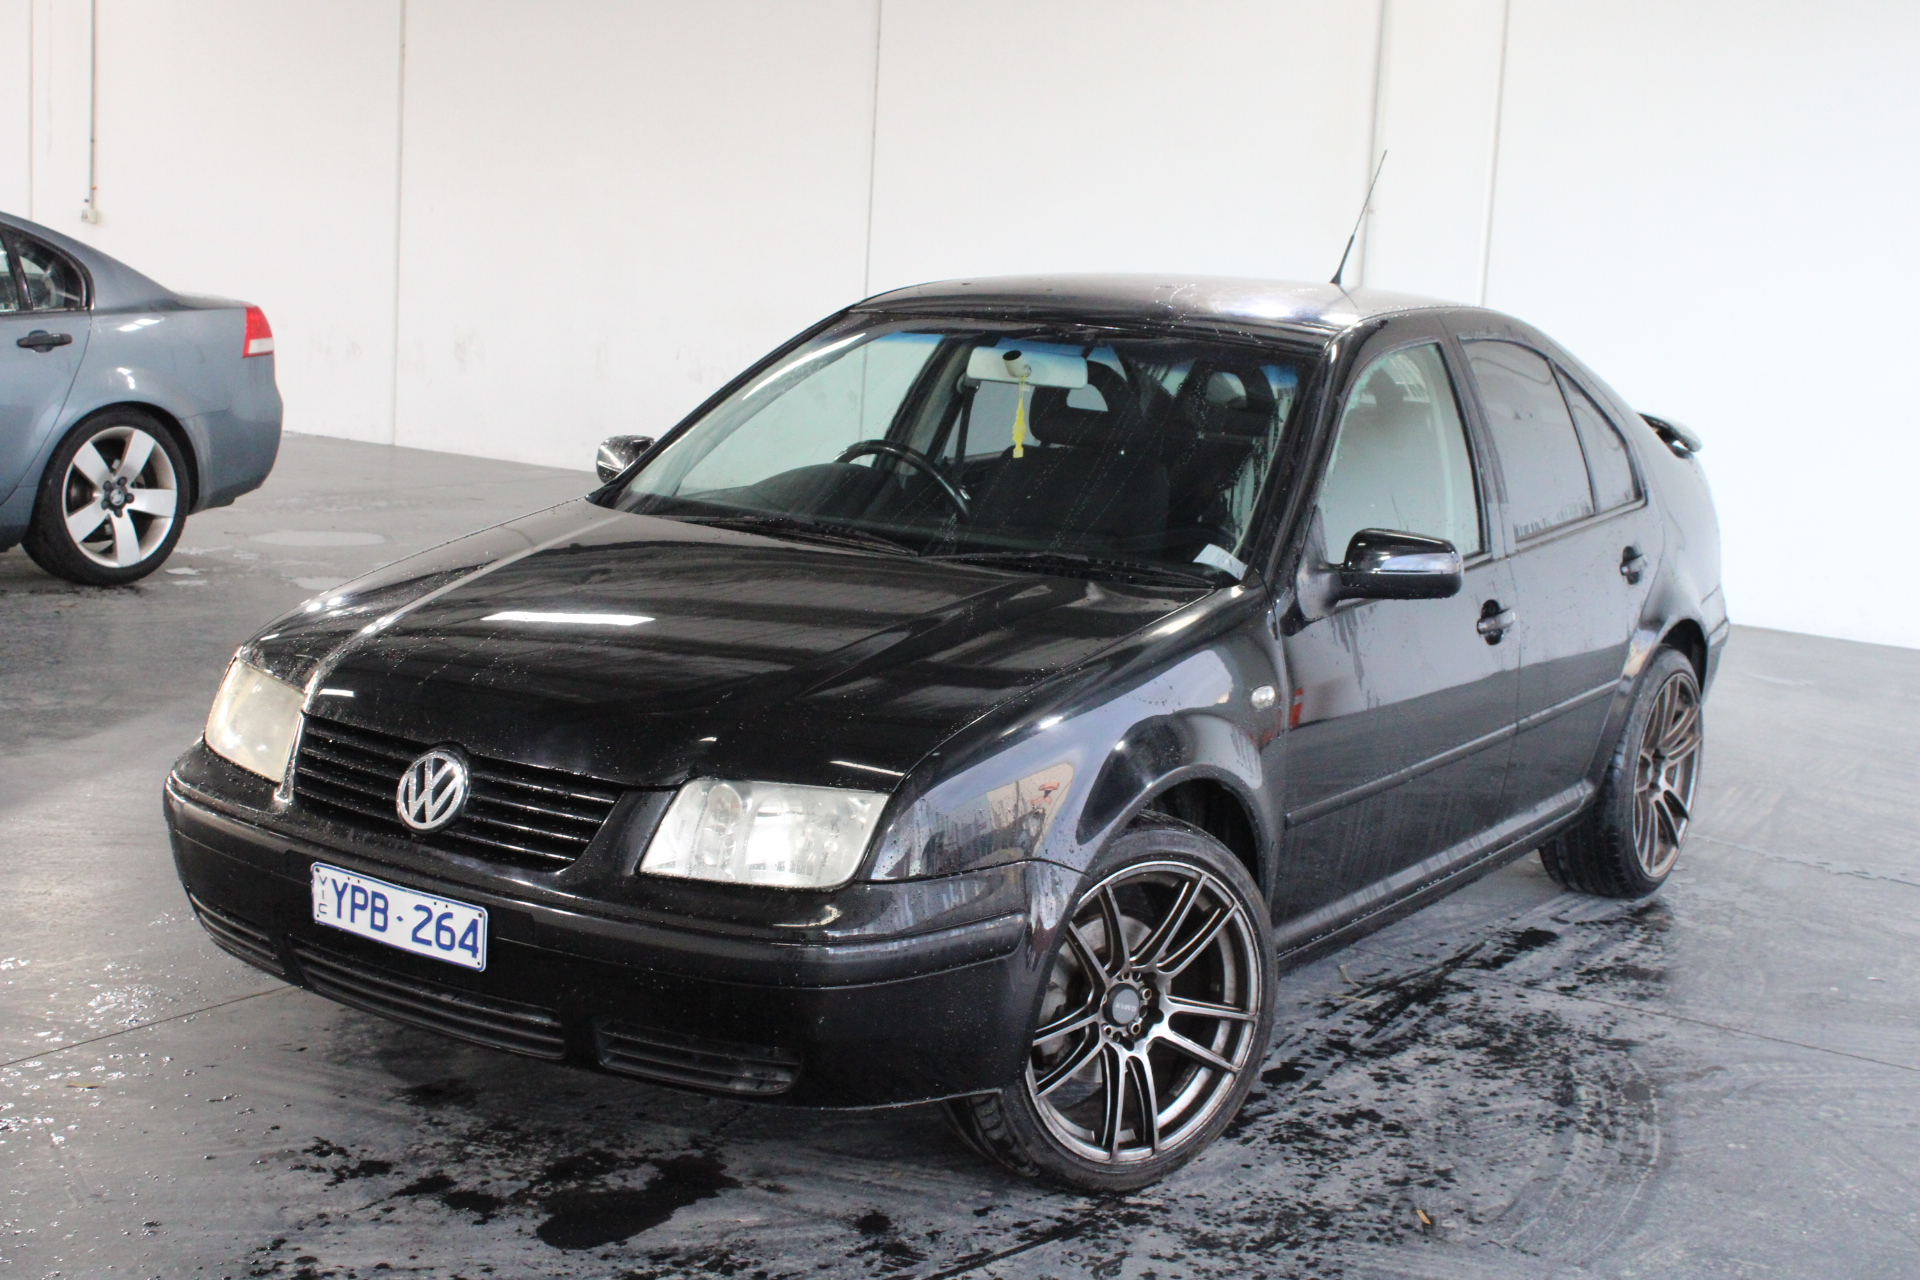 2000 Volkswagen Bora 2.0 1J Automatic Sedan